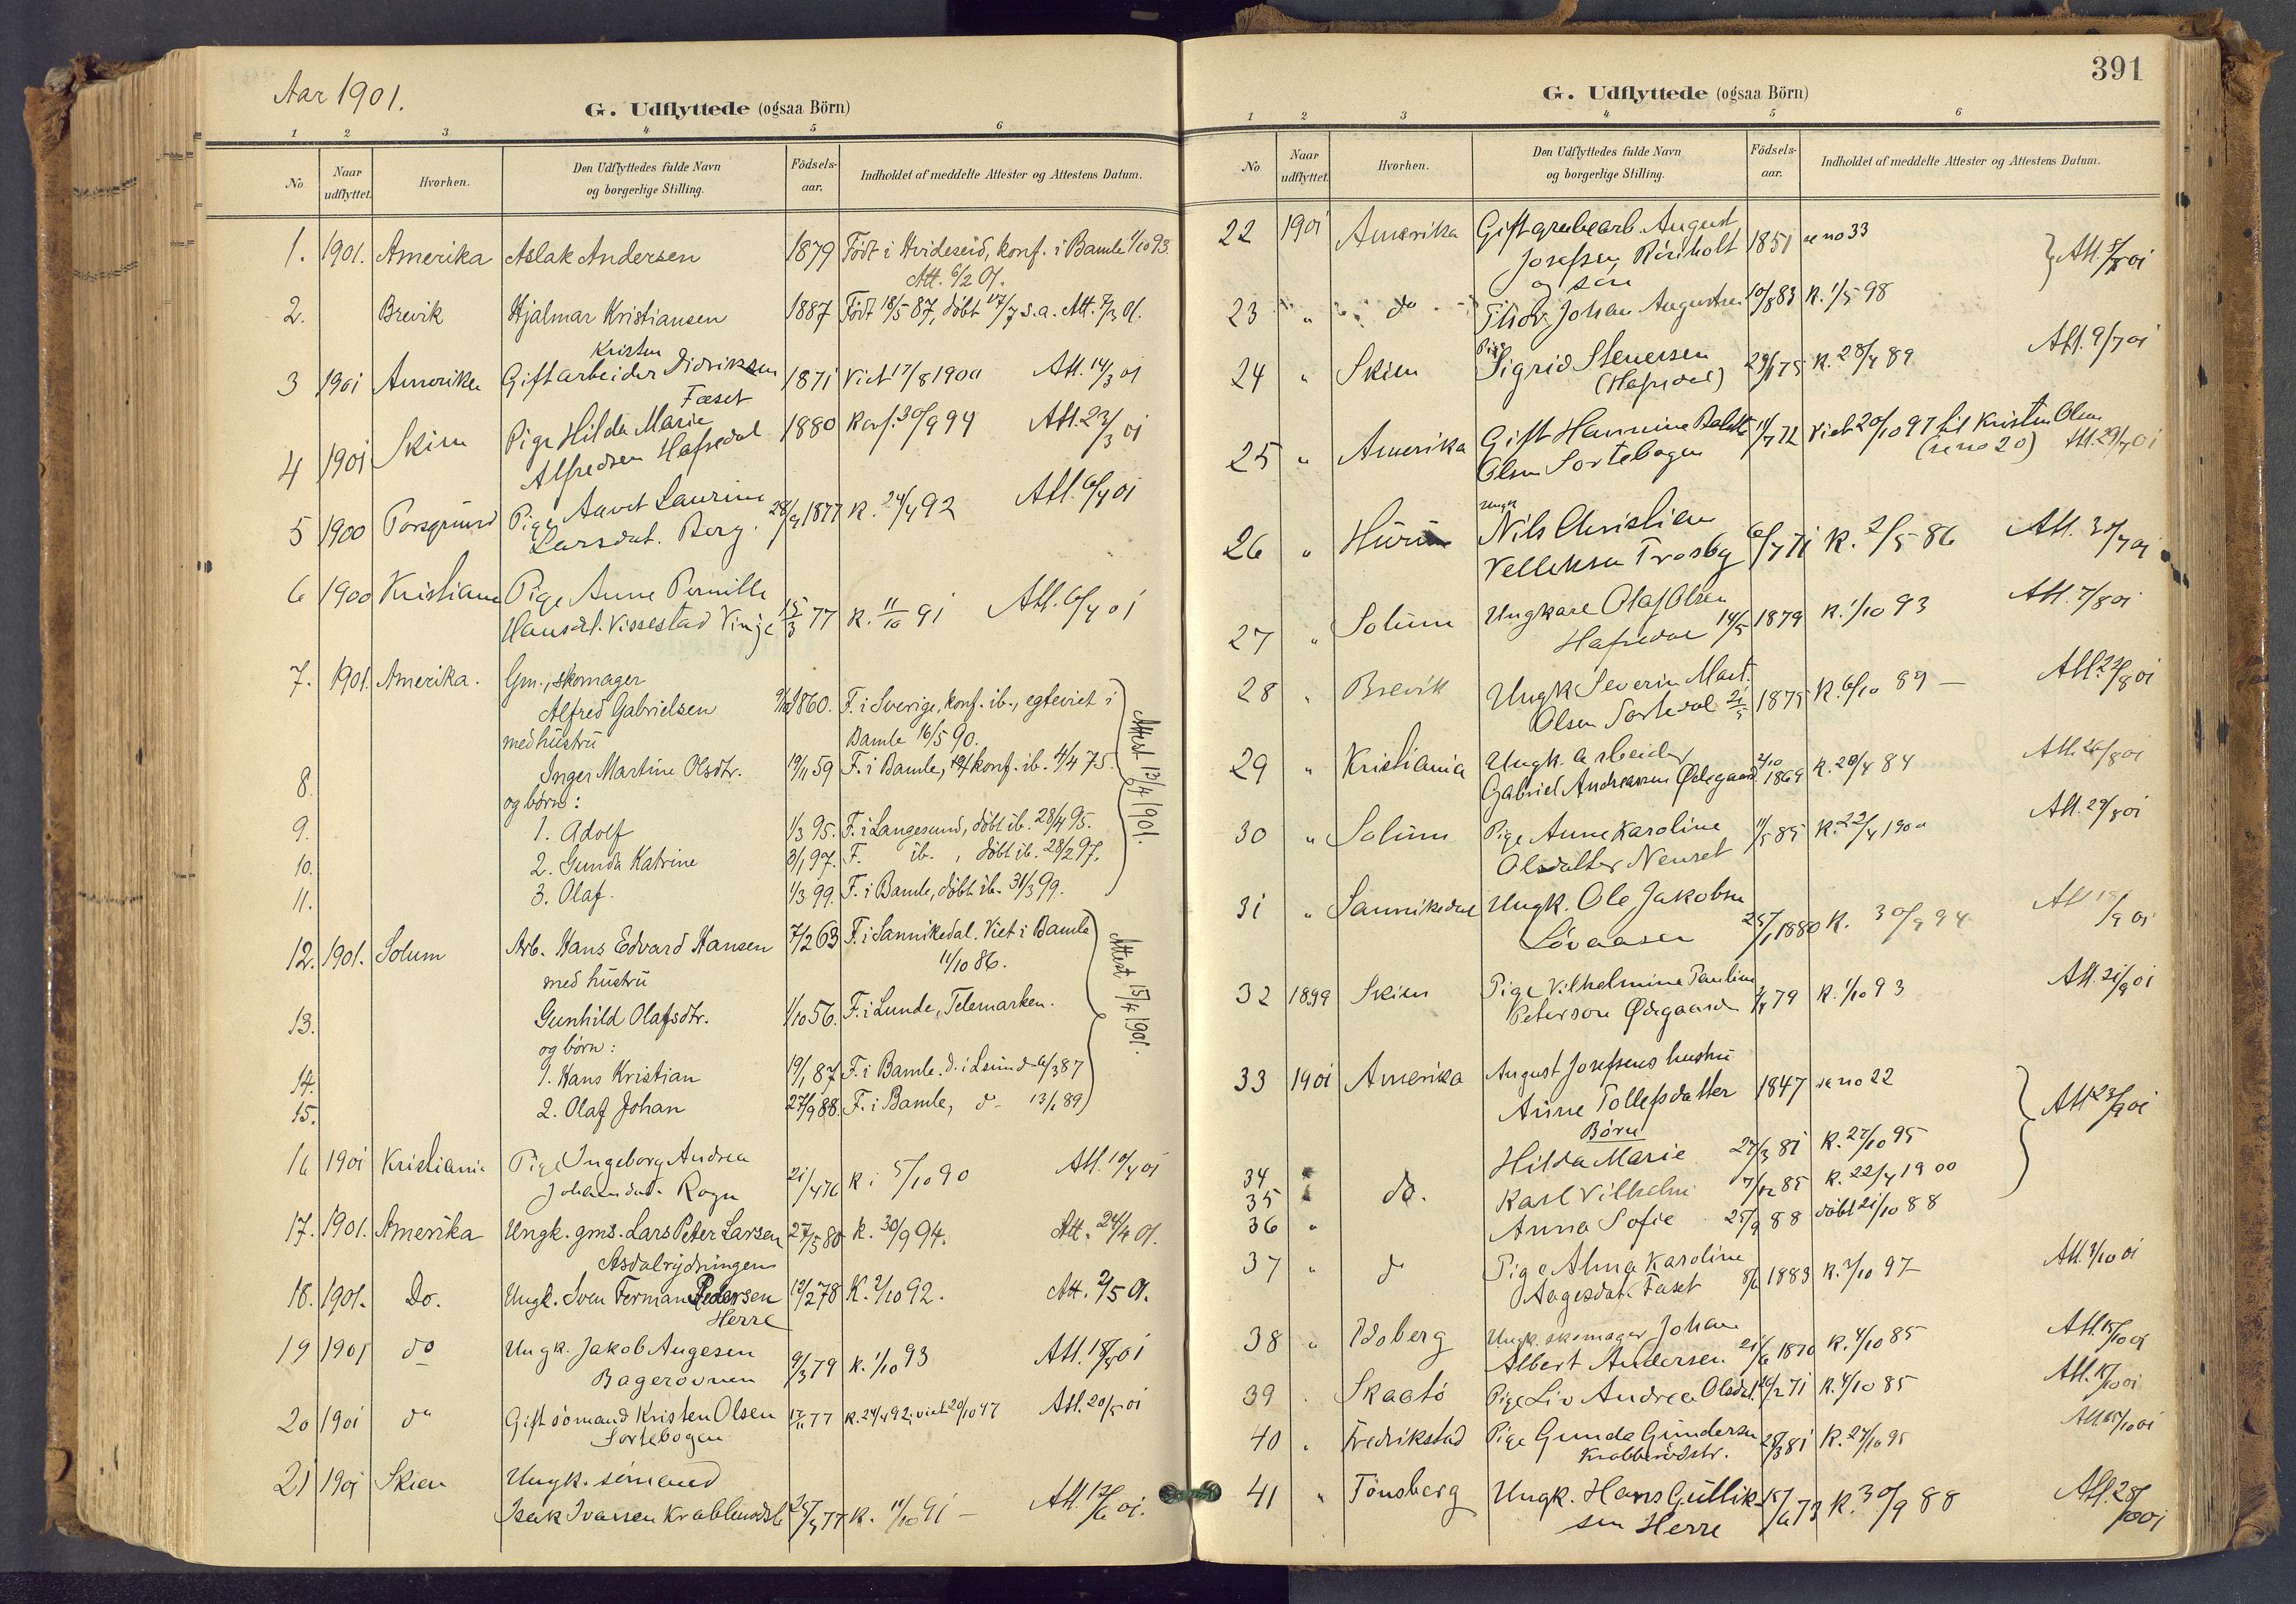 SAKO, Bamble kirkebøker, F/Fa/L0009: Ministerialbok nr. I 9, 1901-1917, s. 391